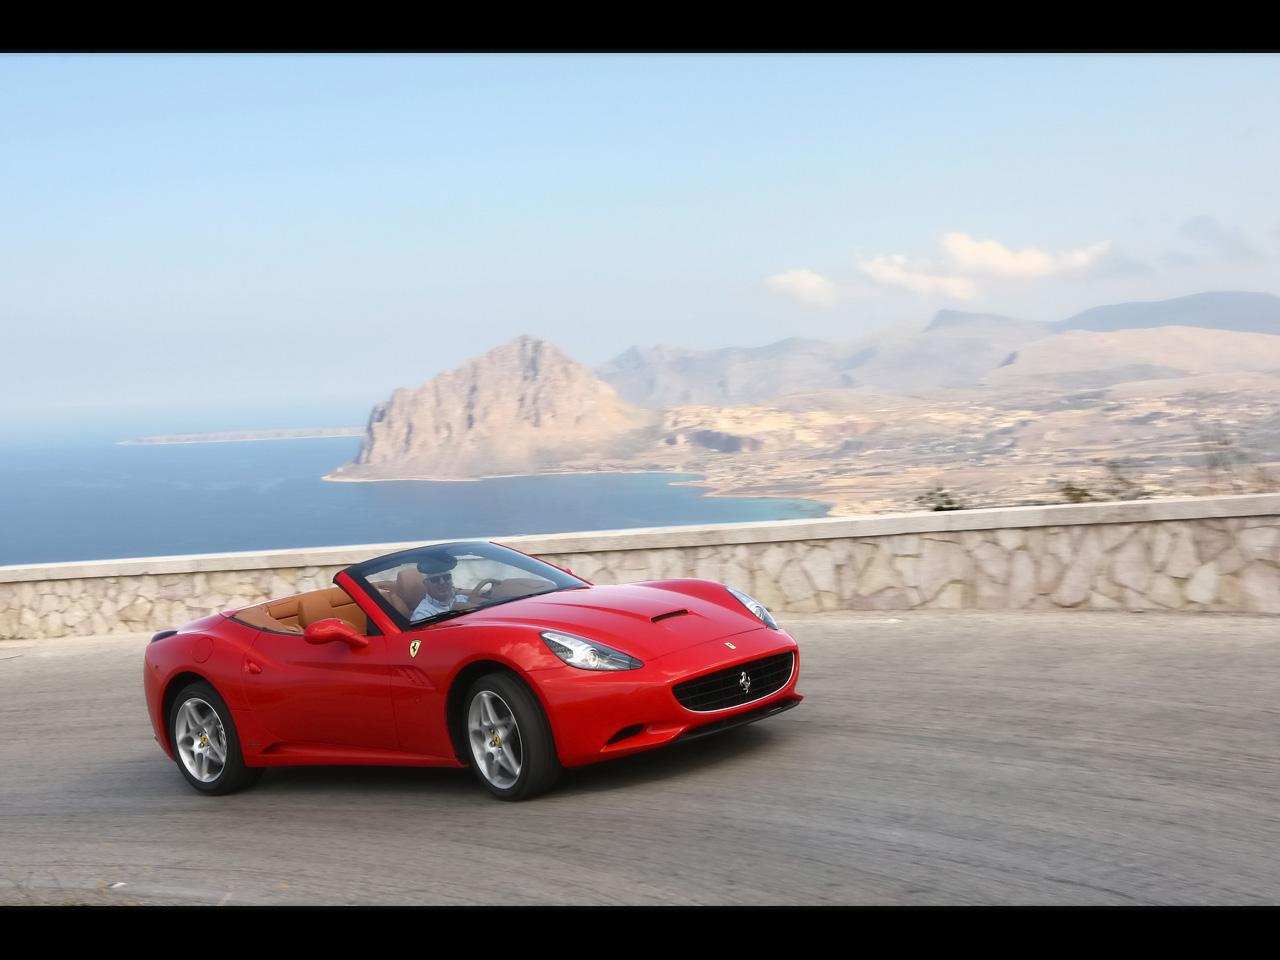 Best Wallpapers: Ferrari California Wallpapers